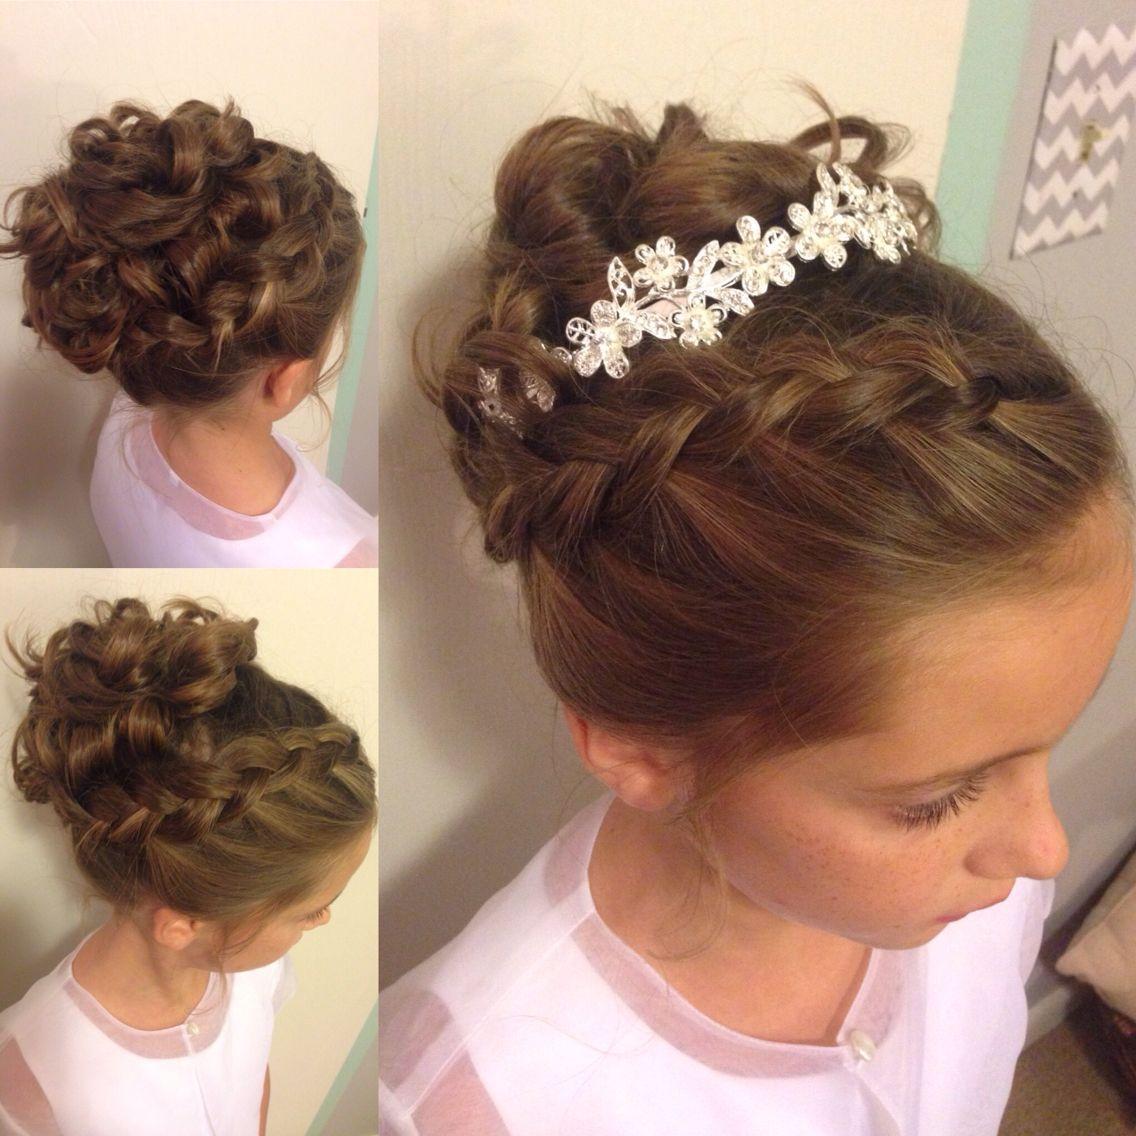 Little girl updo. Wedding hairstyle Instagram ...